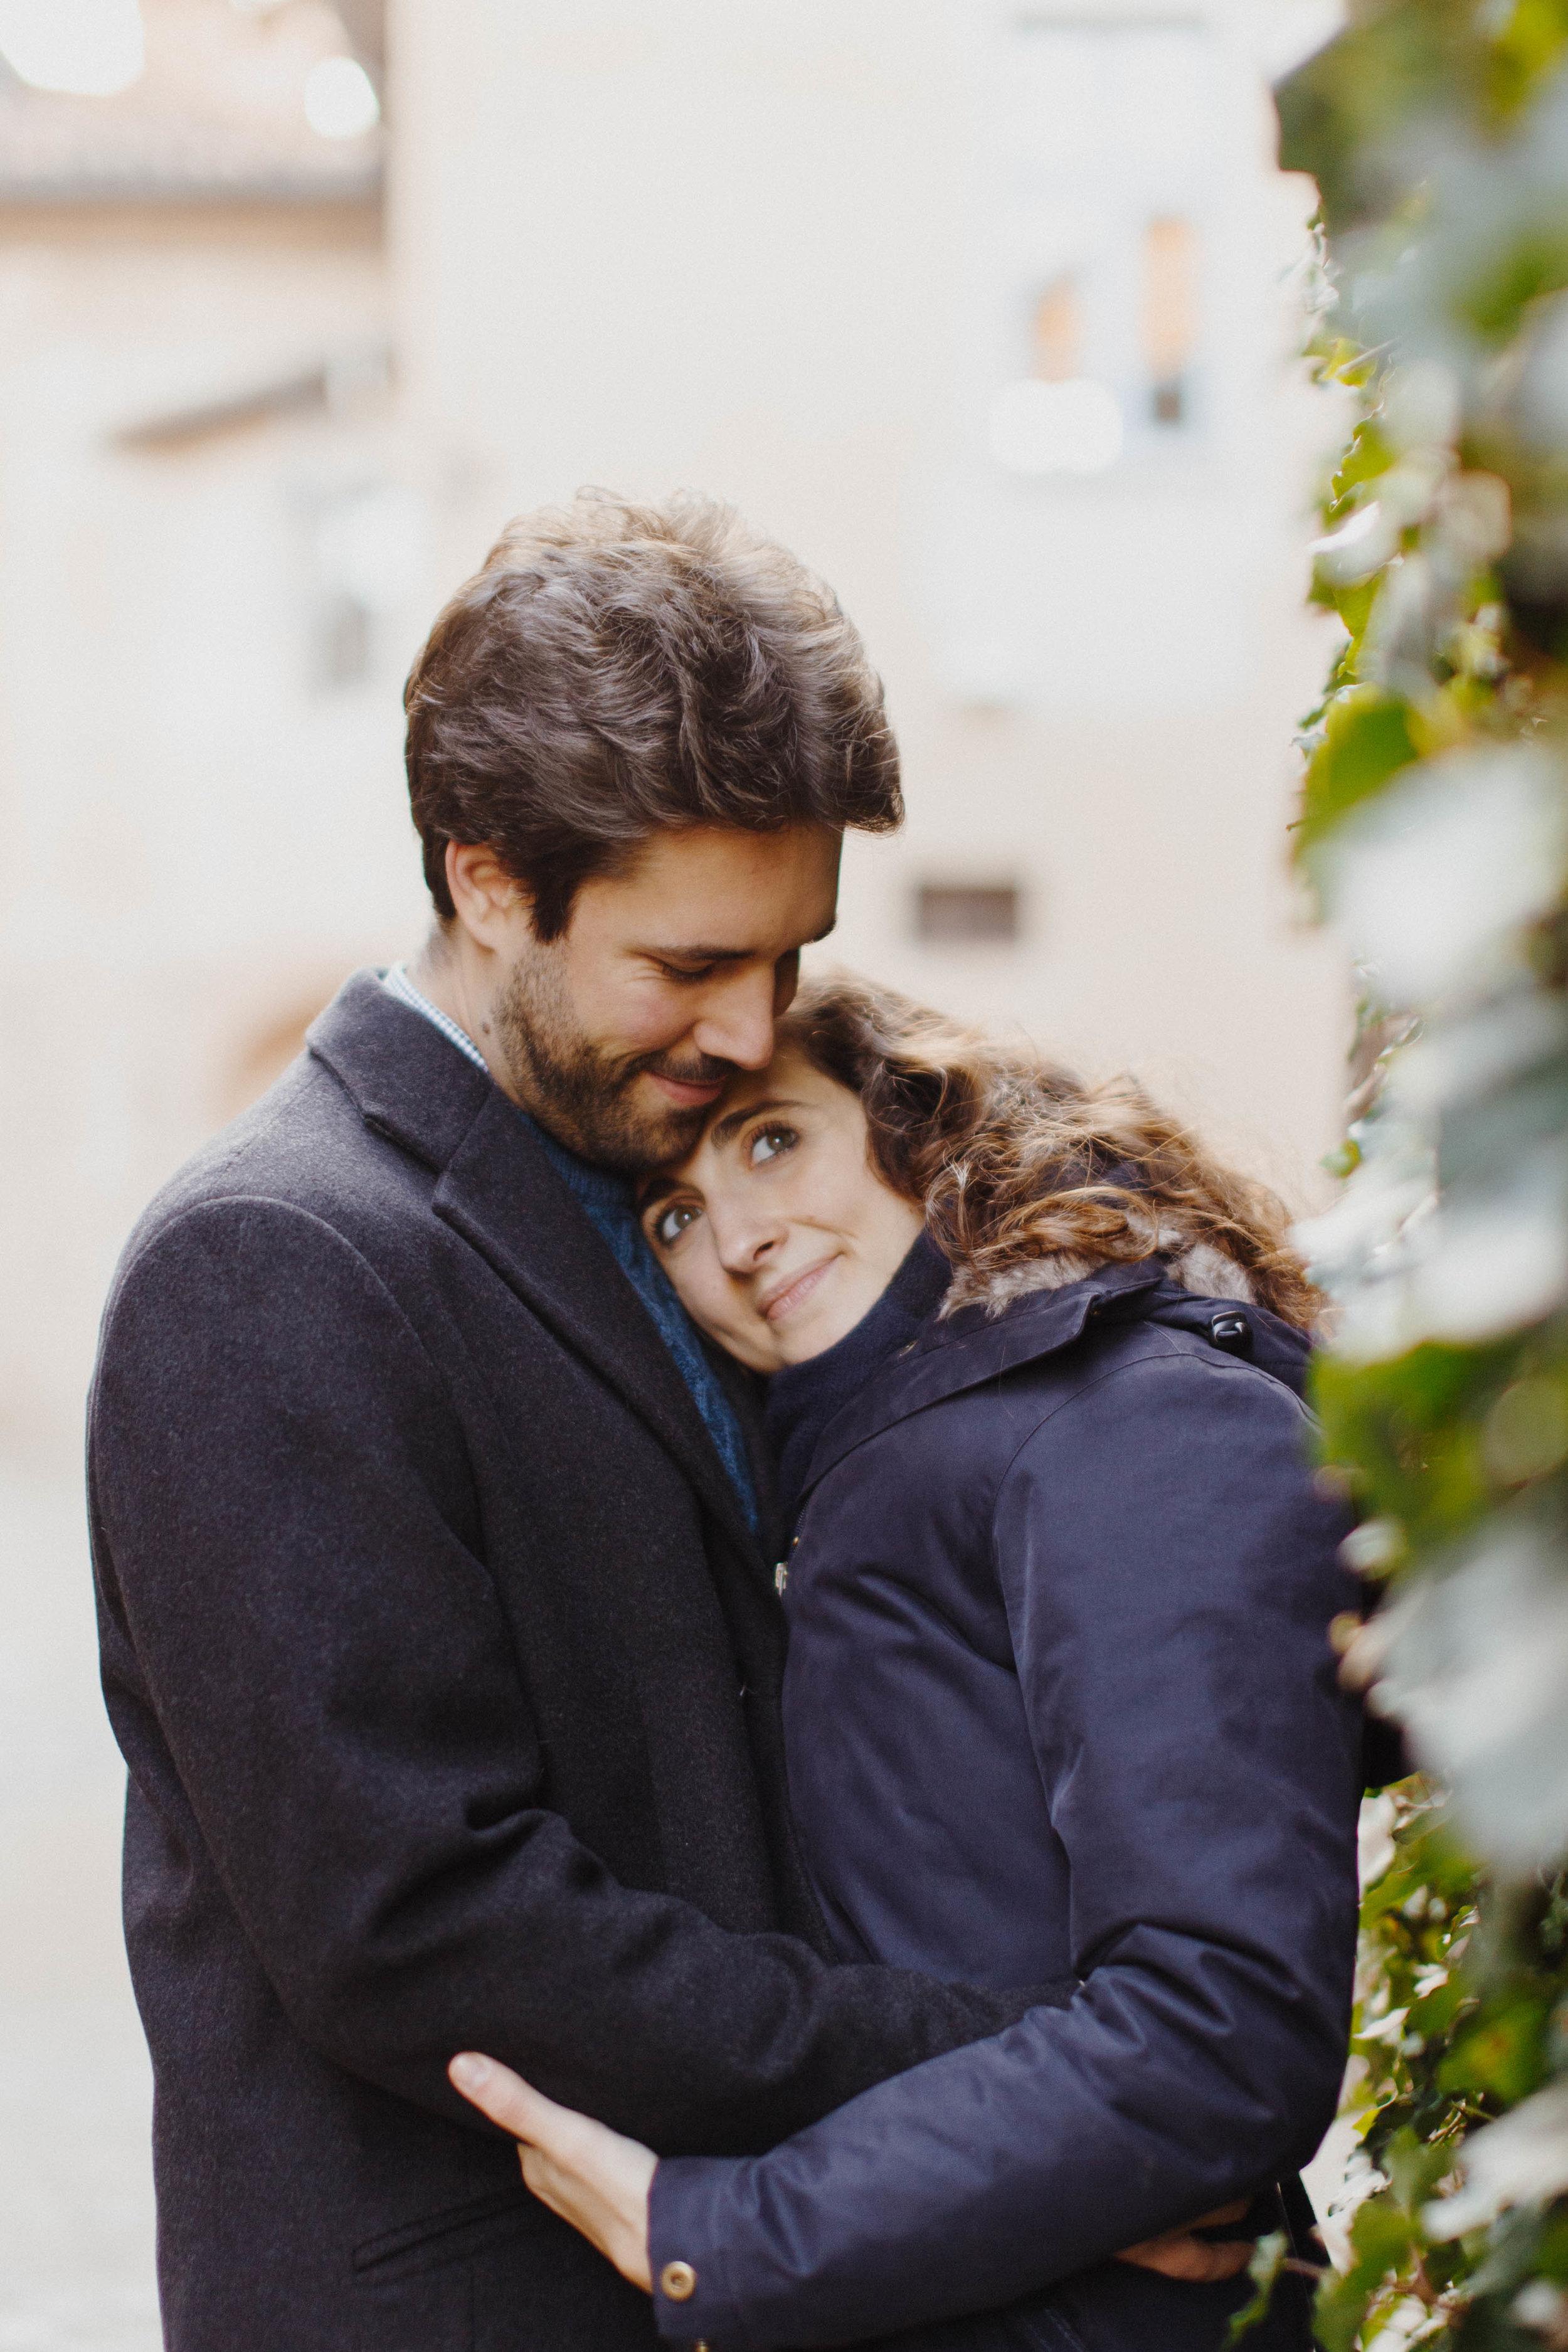 072 - Elisa + Riccardo - engagement.JPG